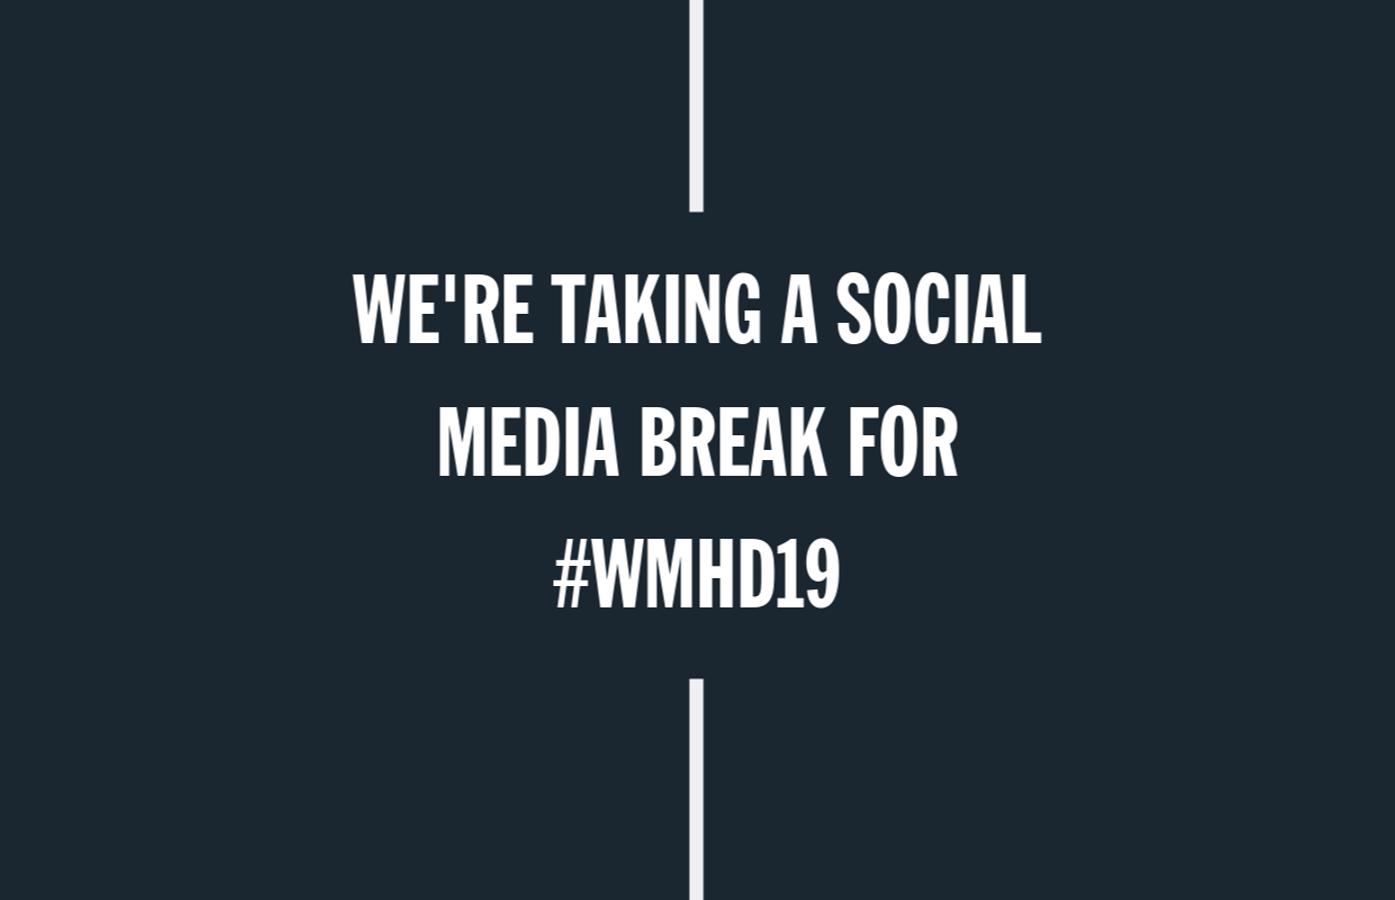 Instagram Post for World Mental Health Day